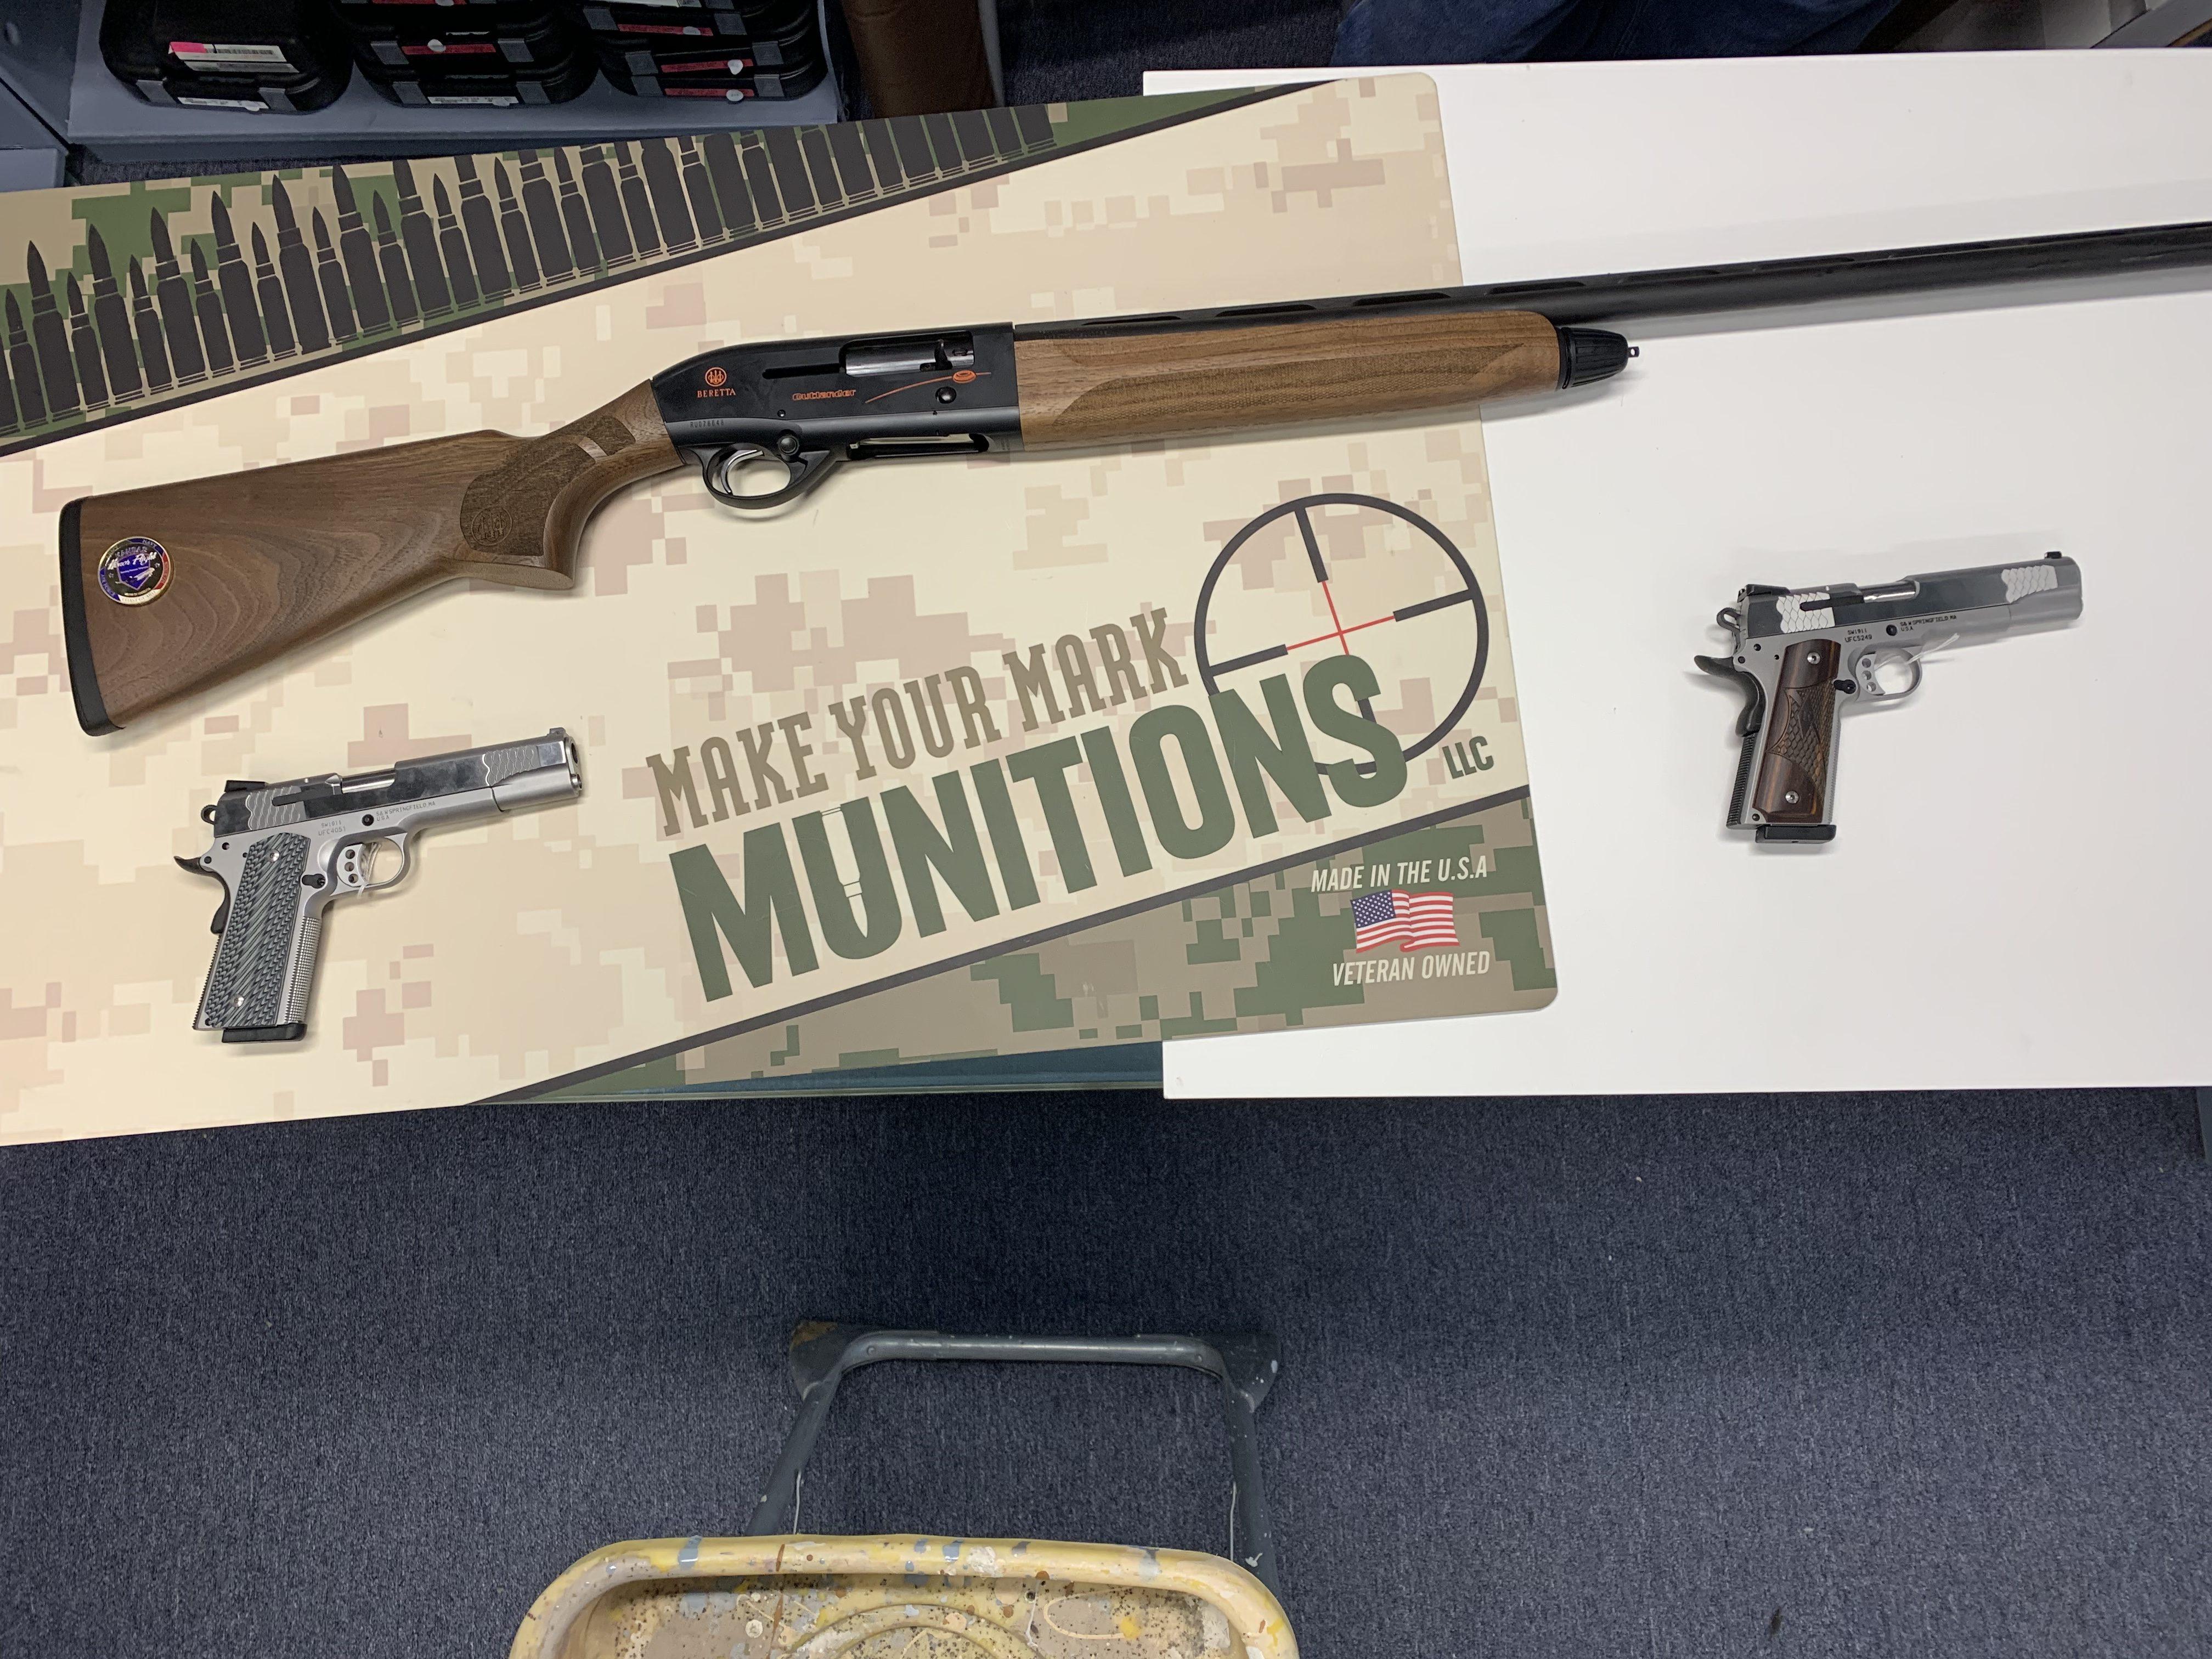 Beretta A300 Outlander Sporting Shotgun to be raffled off during golf tournament fundraiser.